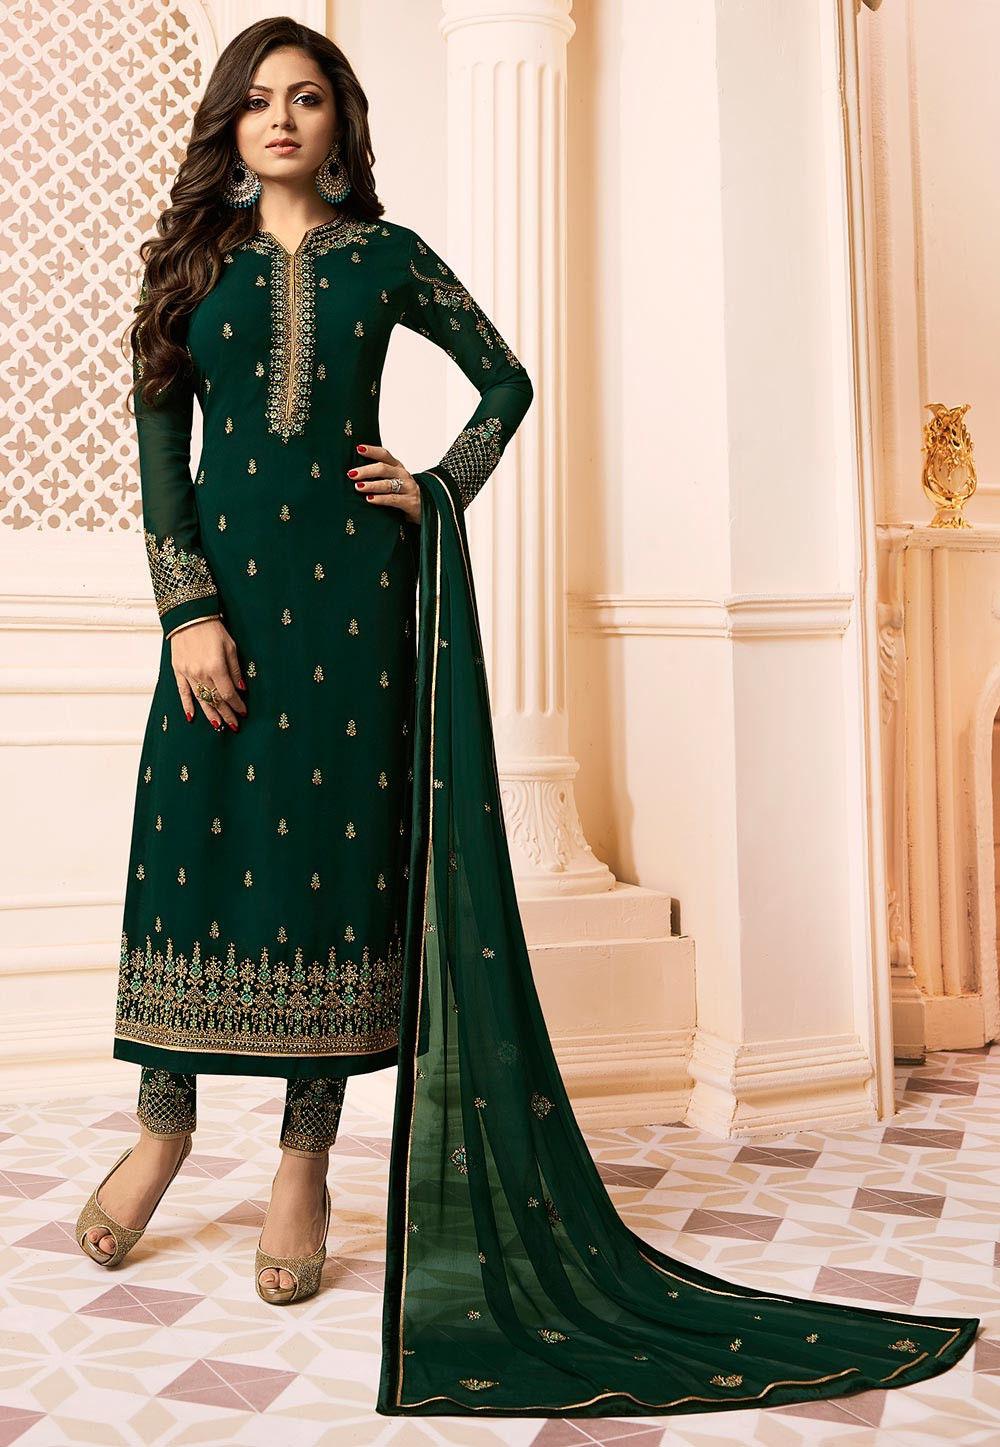 70306e2891 Utsav Fashion · Salwar Kameez; Embroidered Georgette Pakistani Suit in Dark  Green. Zoom